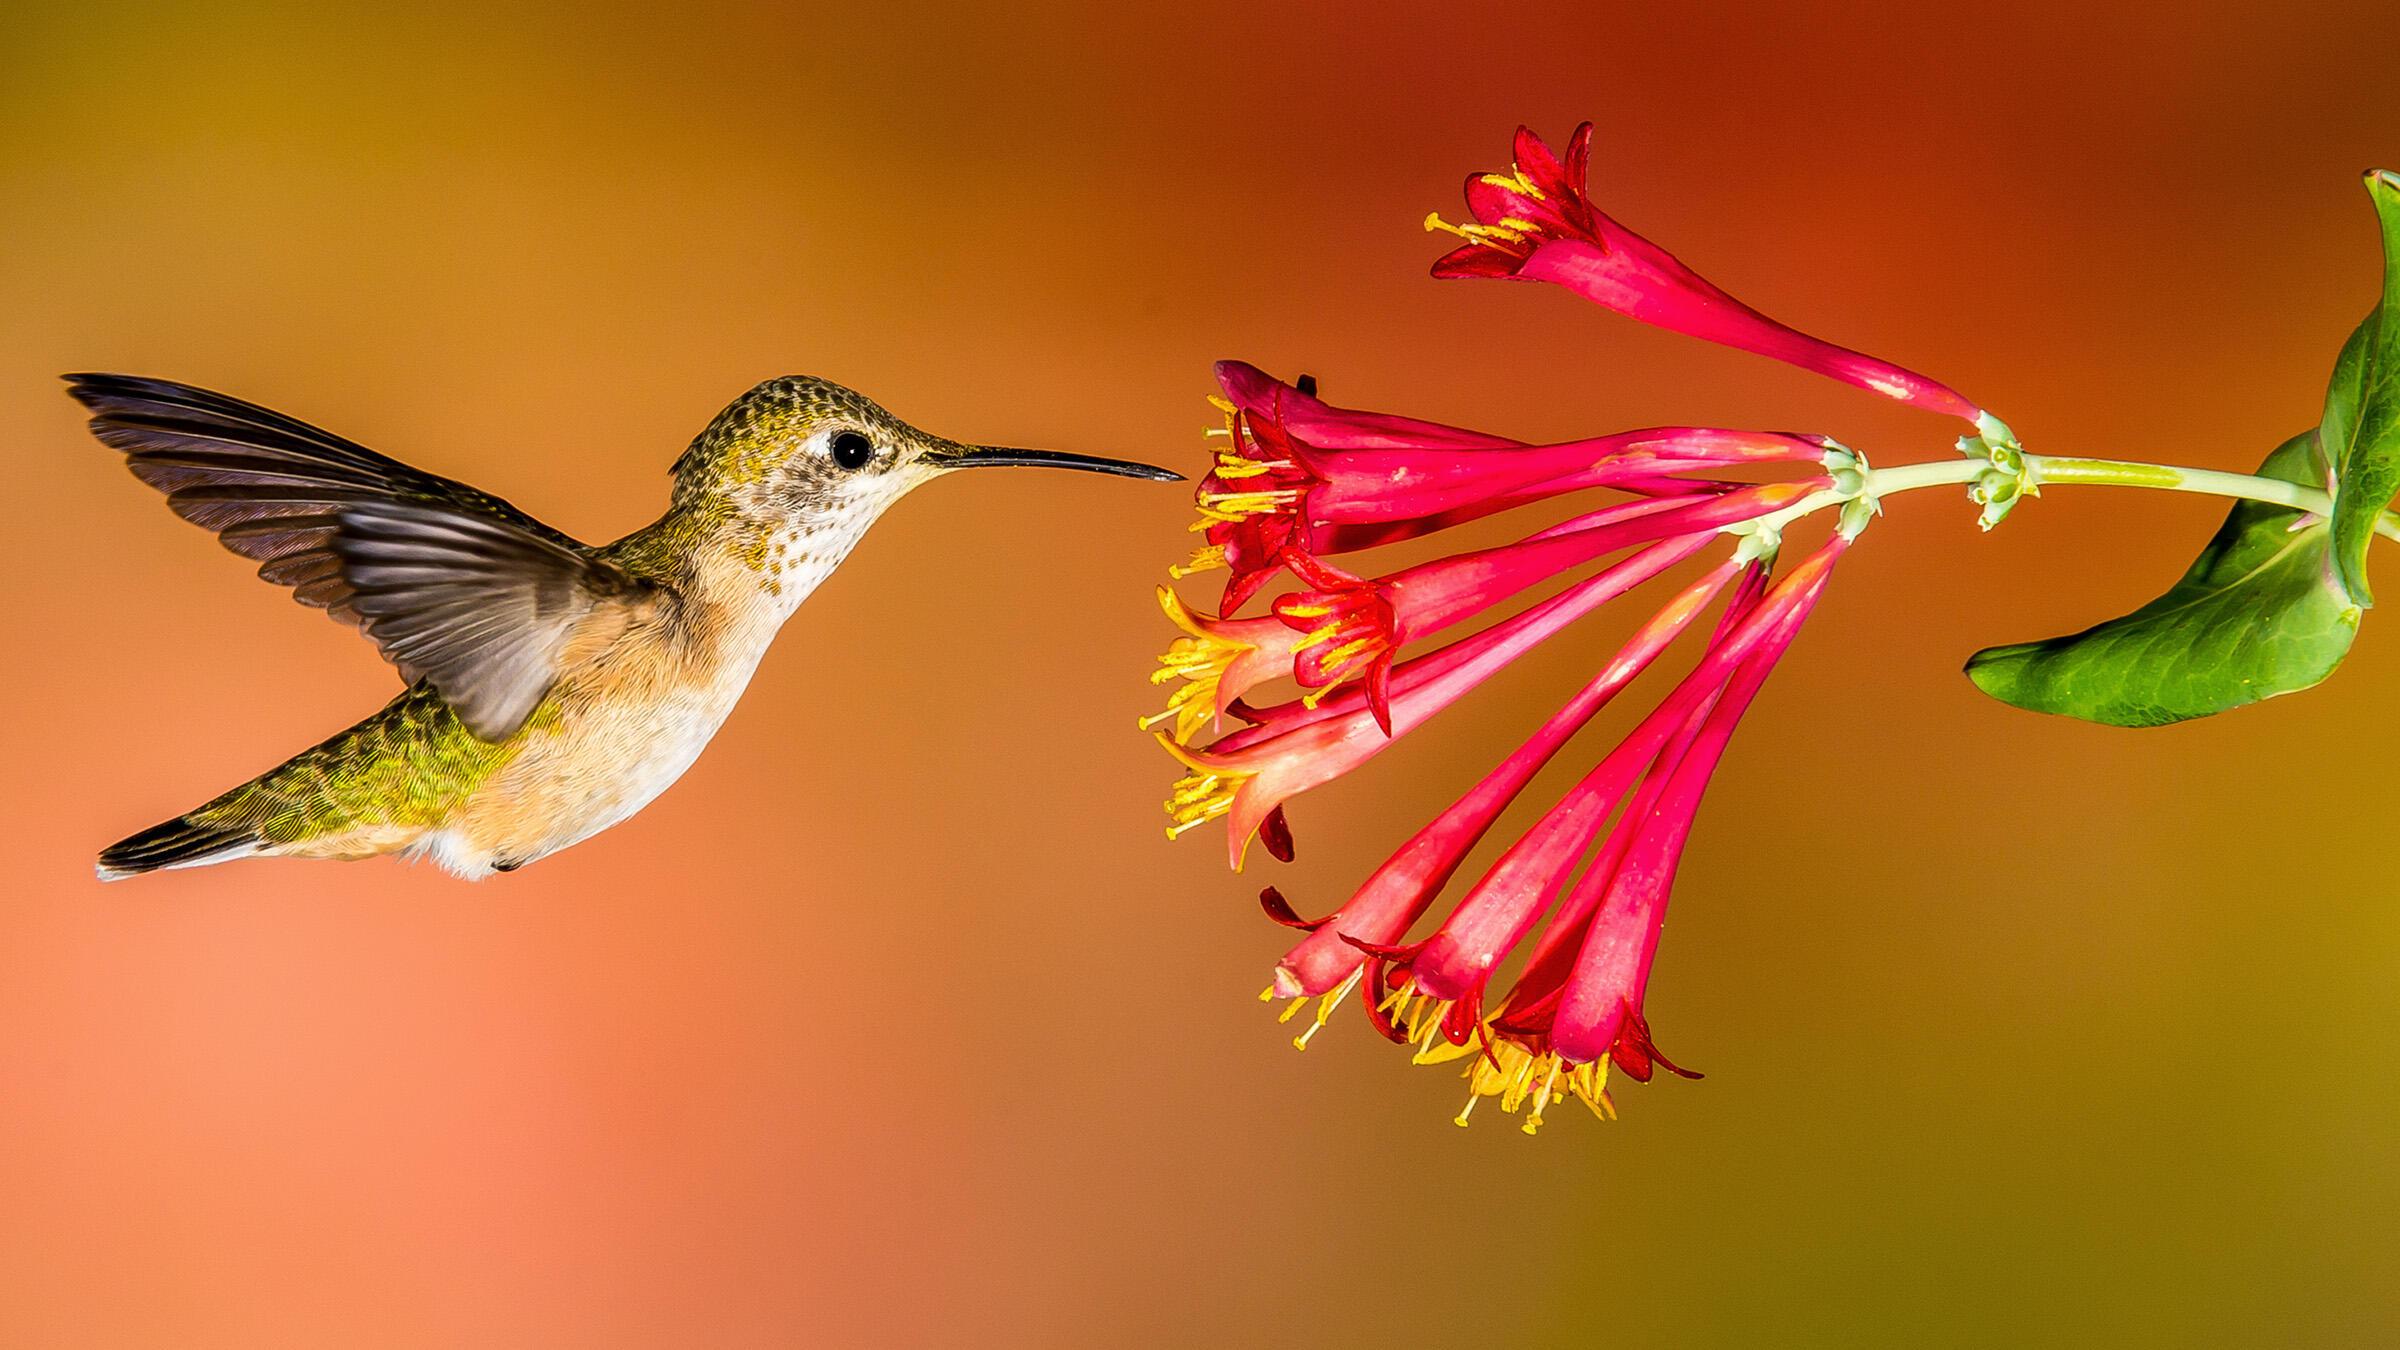 Broad-tailed Hummingbird at a Trumpet Honeysuckle. Roger Levien/Audubon Photography Awards